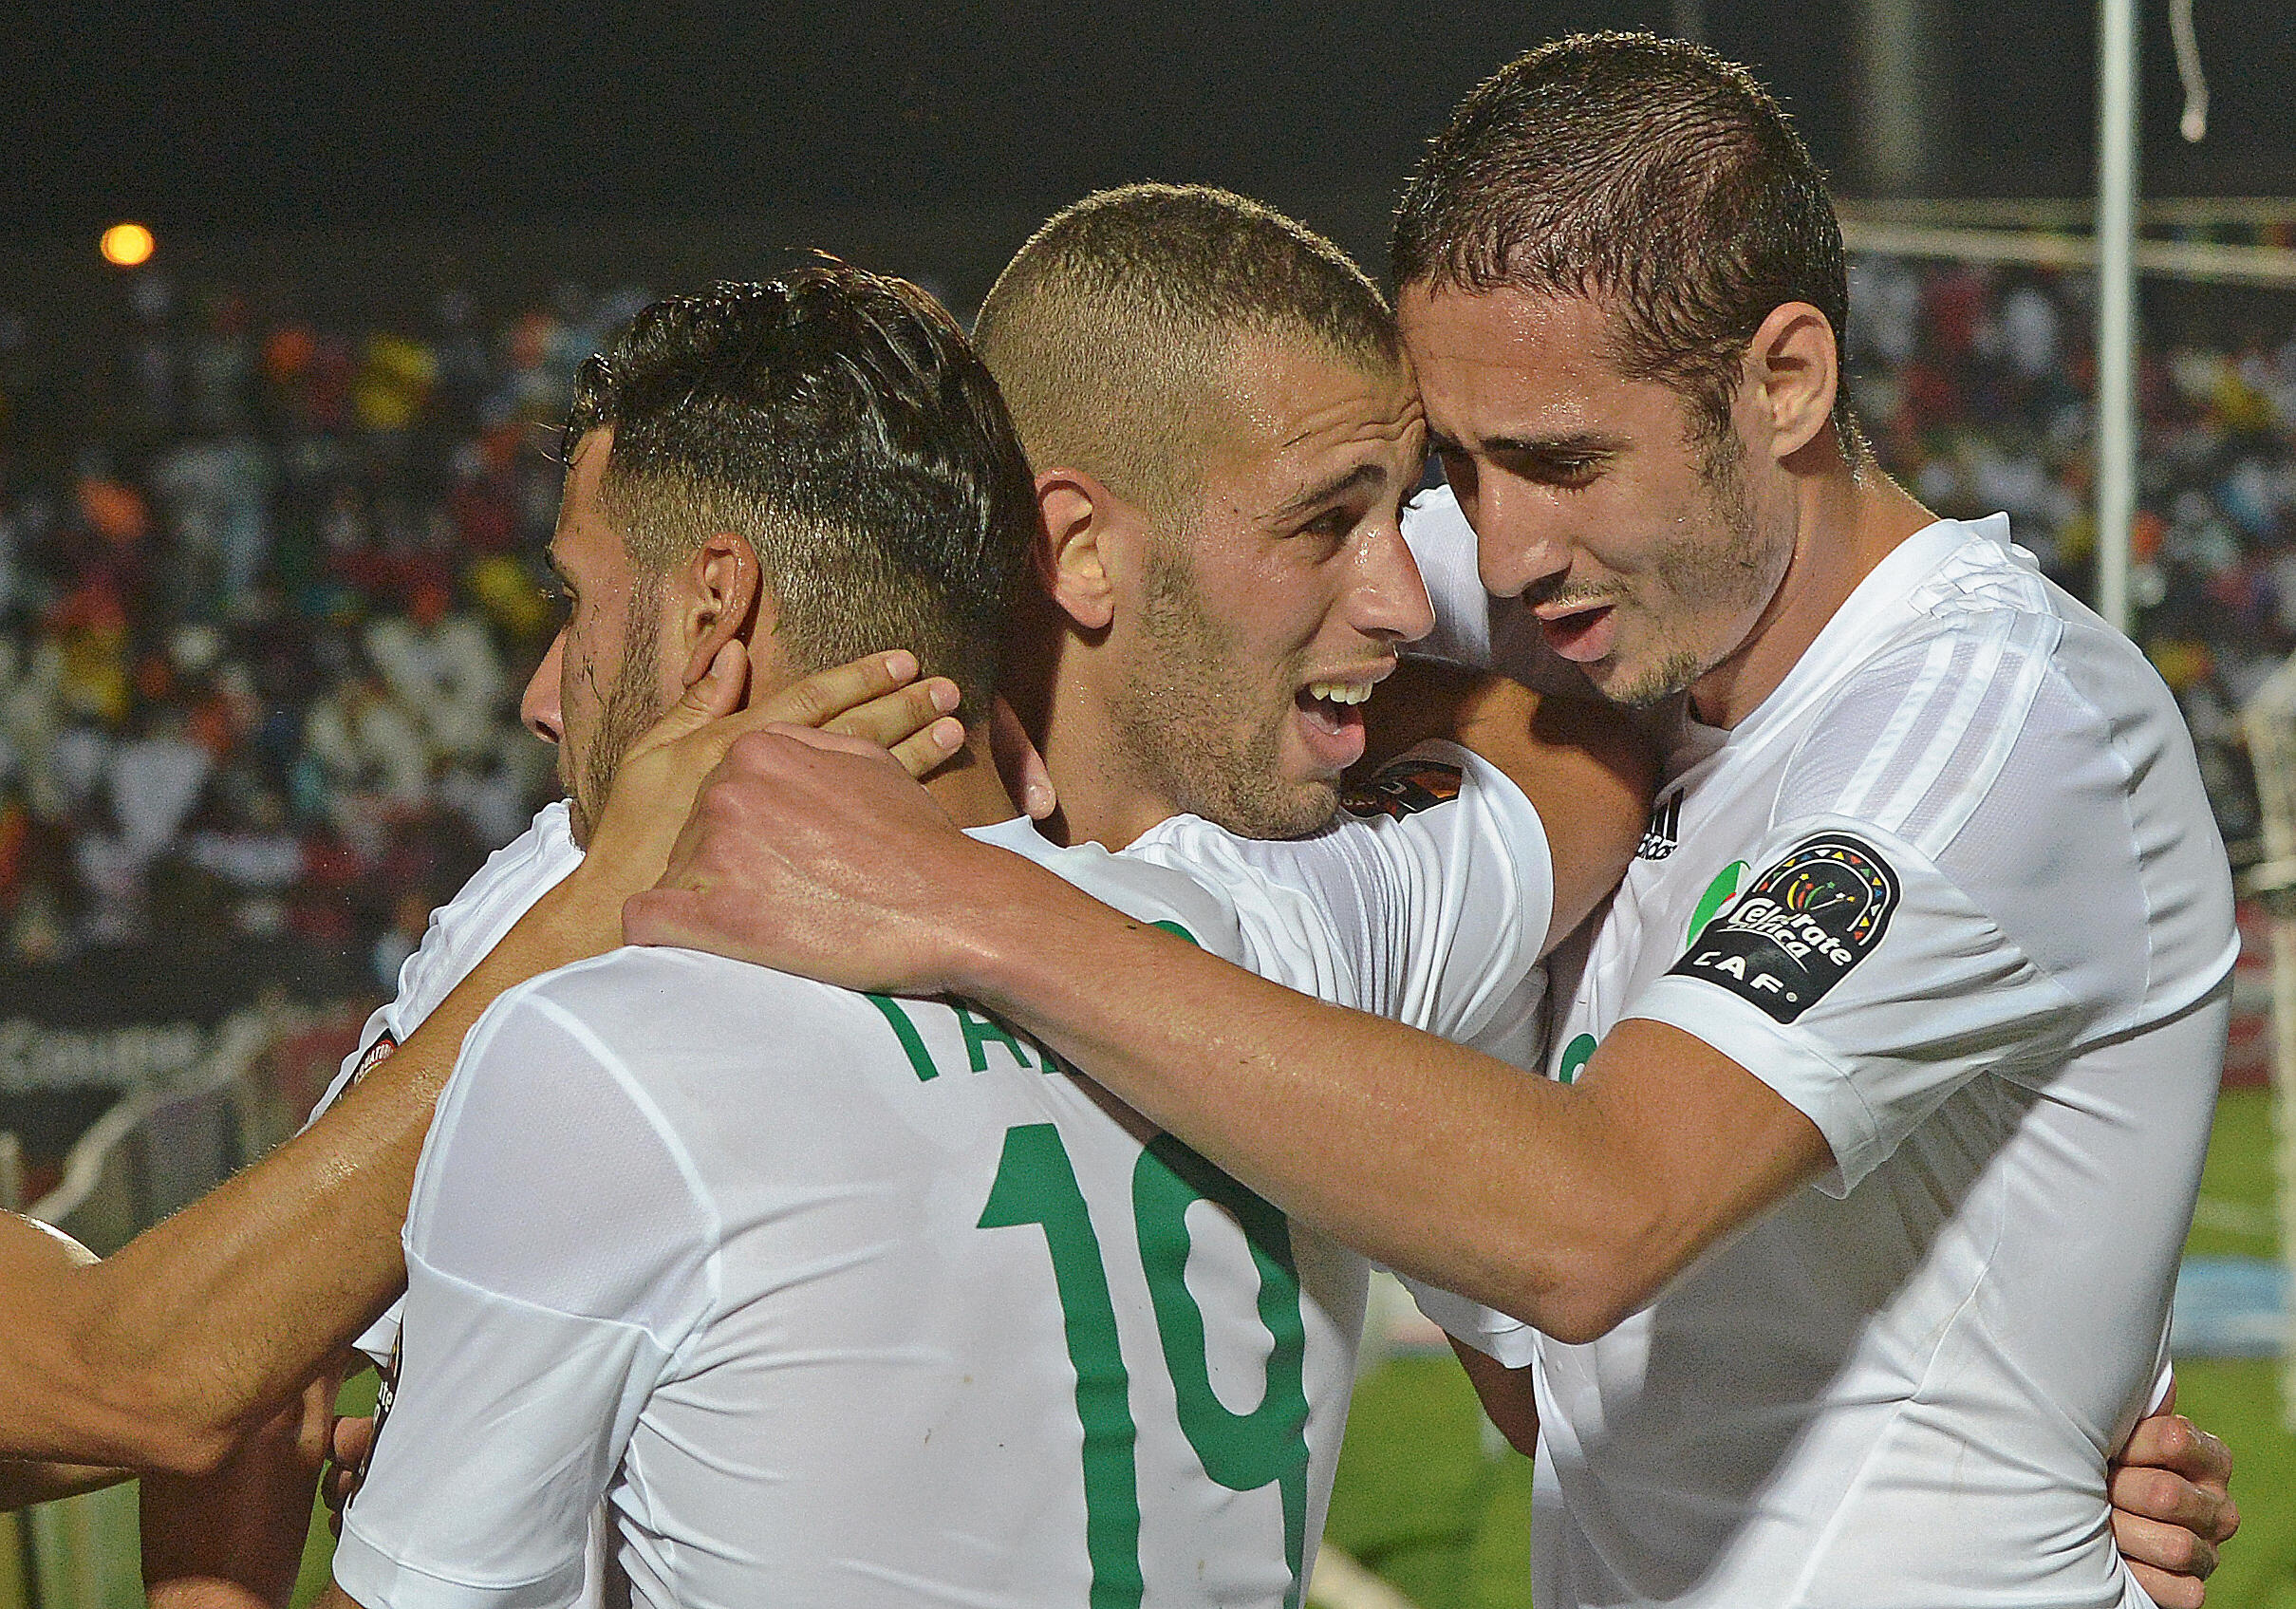 Algeria's Islam Slimani (c) congratulates his teammates after a goal against South Africa